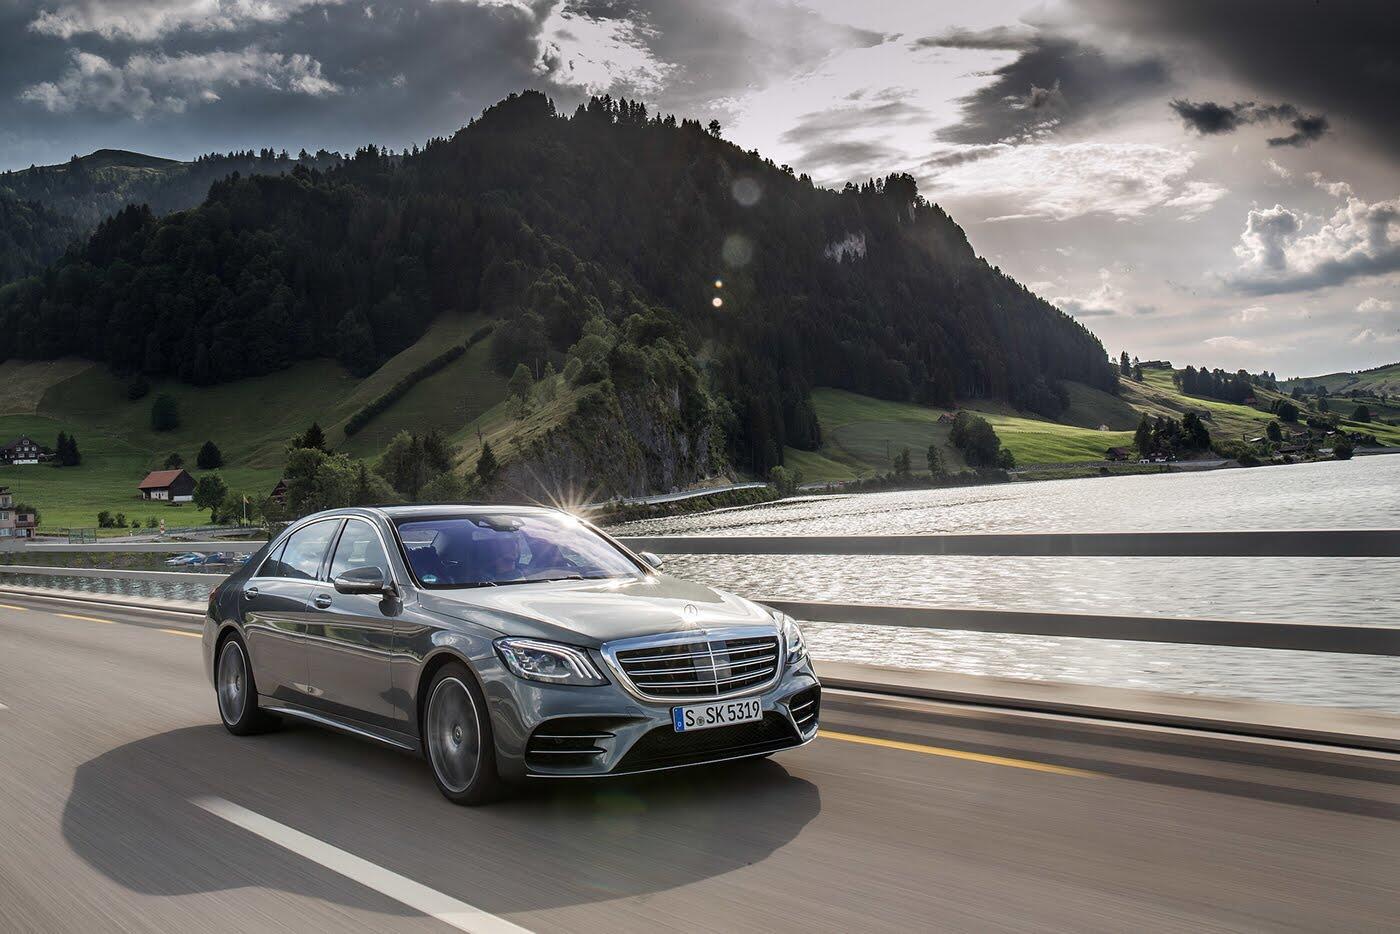 Ảnh chi tiết Mercedes-Benz S-Class 2018 - Hình 26